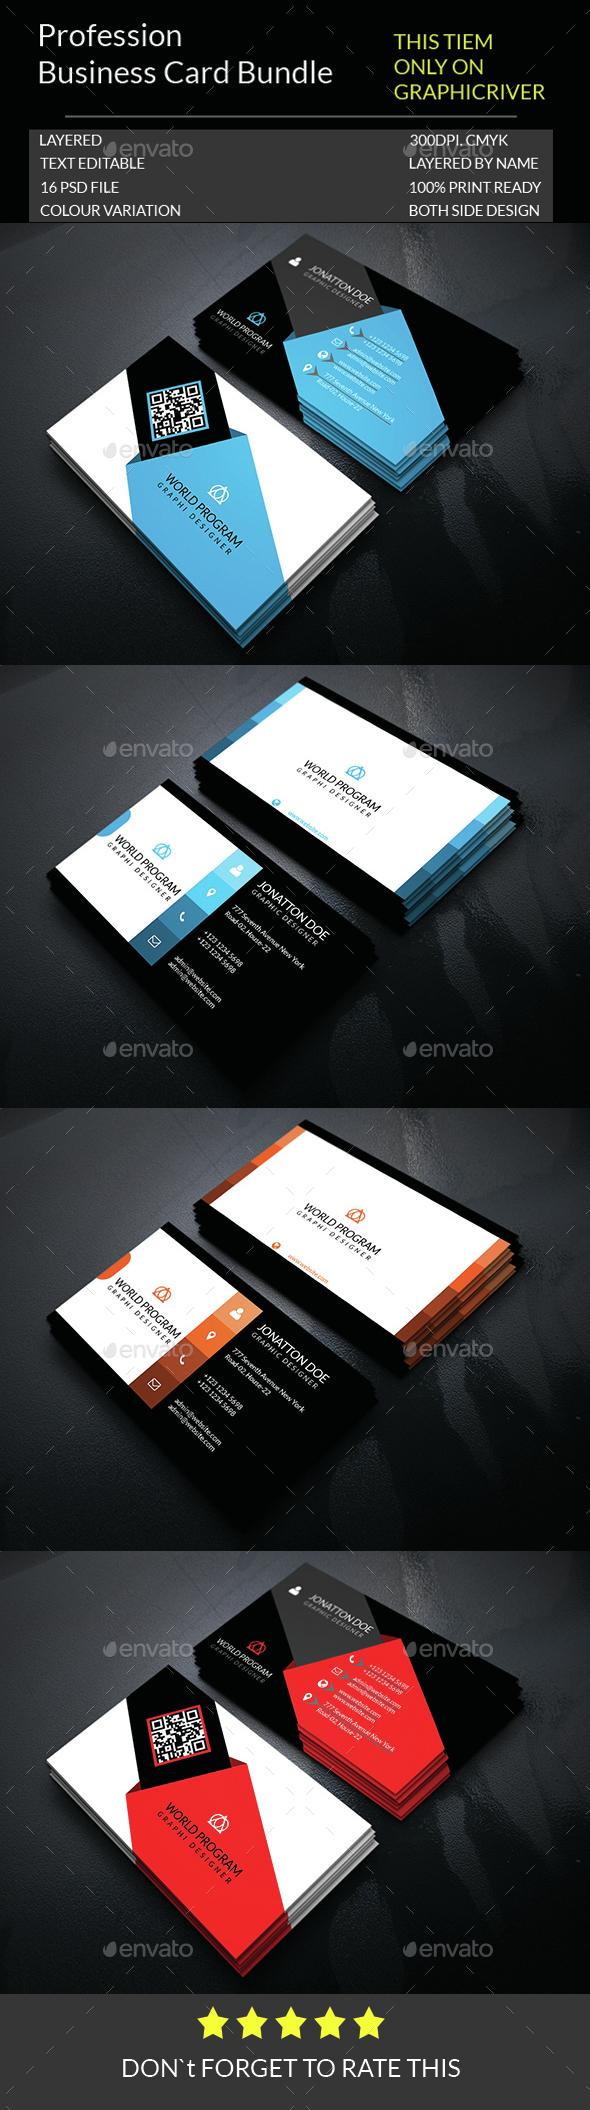 Profession Business Card Bundle.005 - Business Cards Print Templates